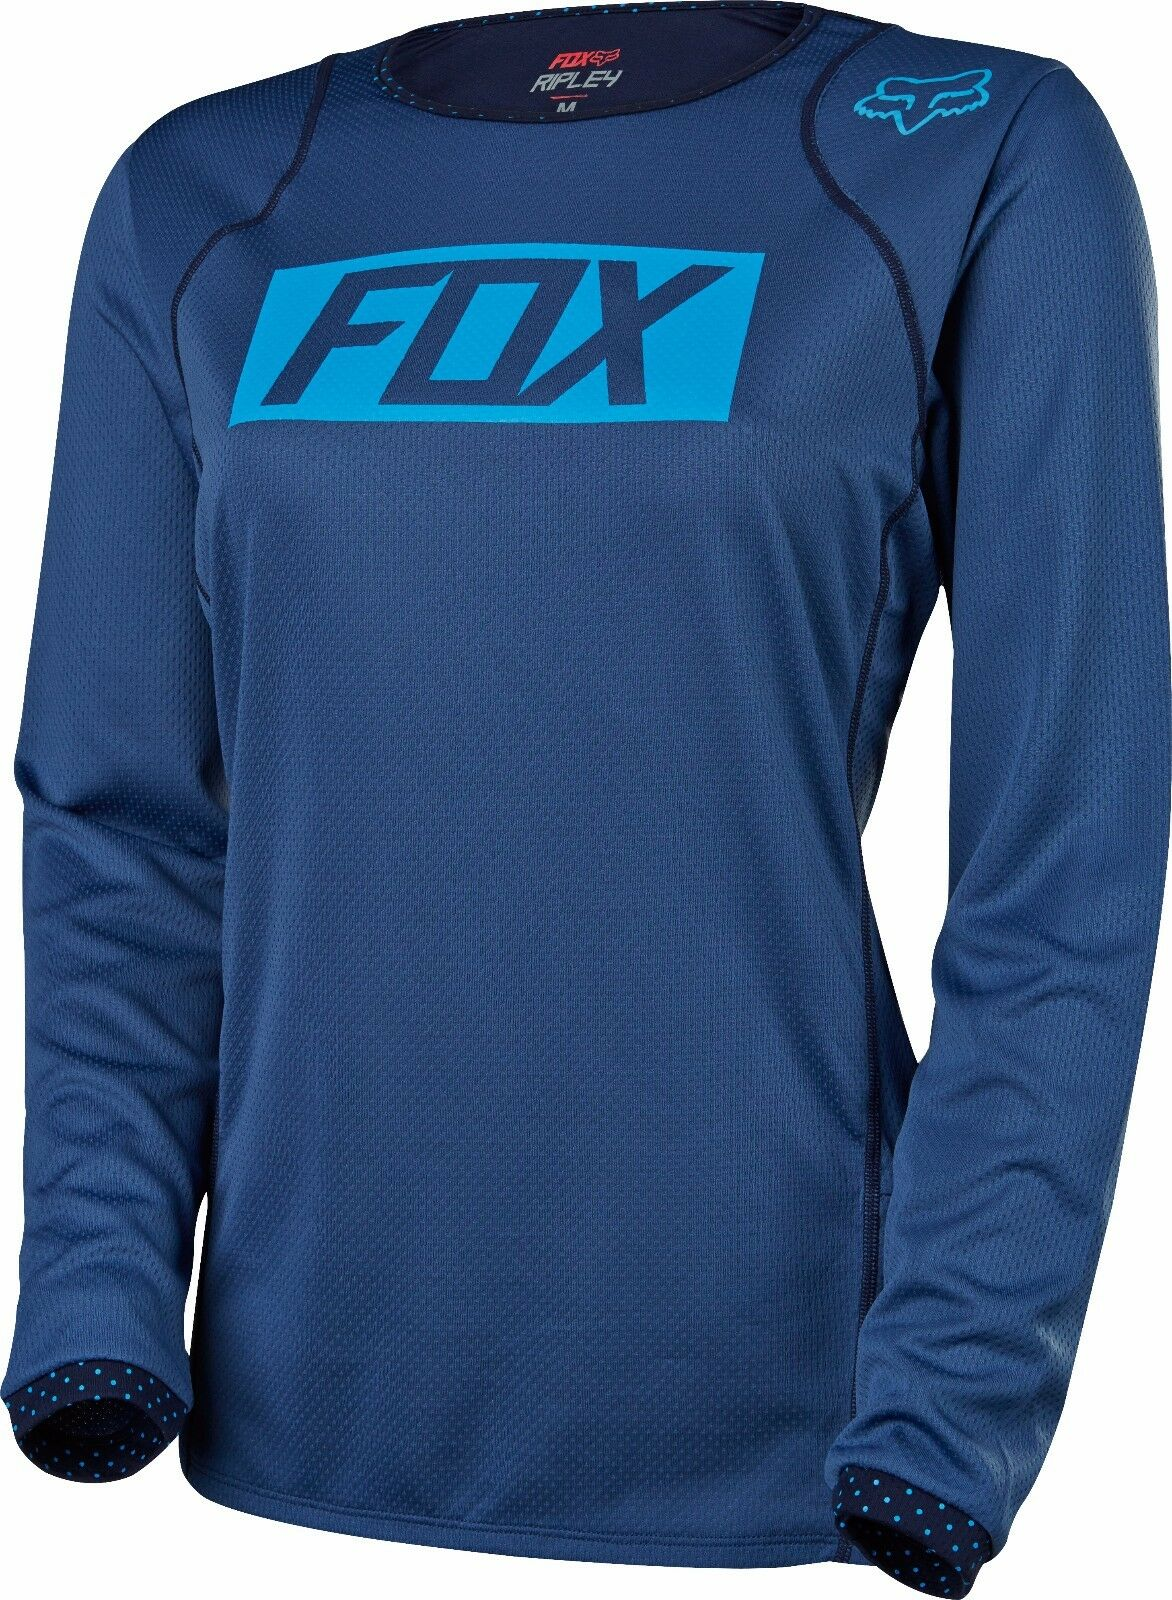 Fox Racing Womens Ripley Long Sleeve L S Jersey Navy